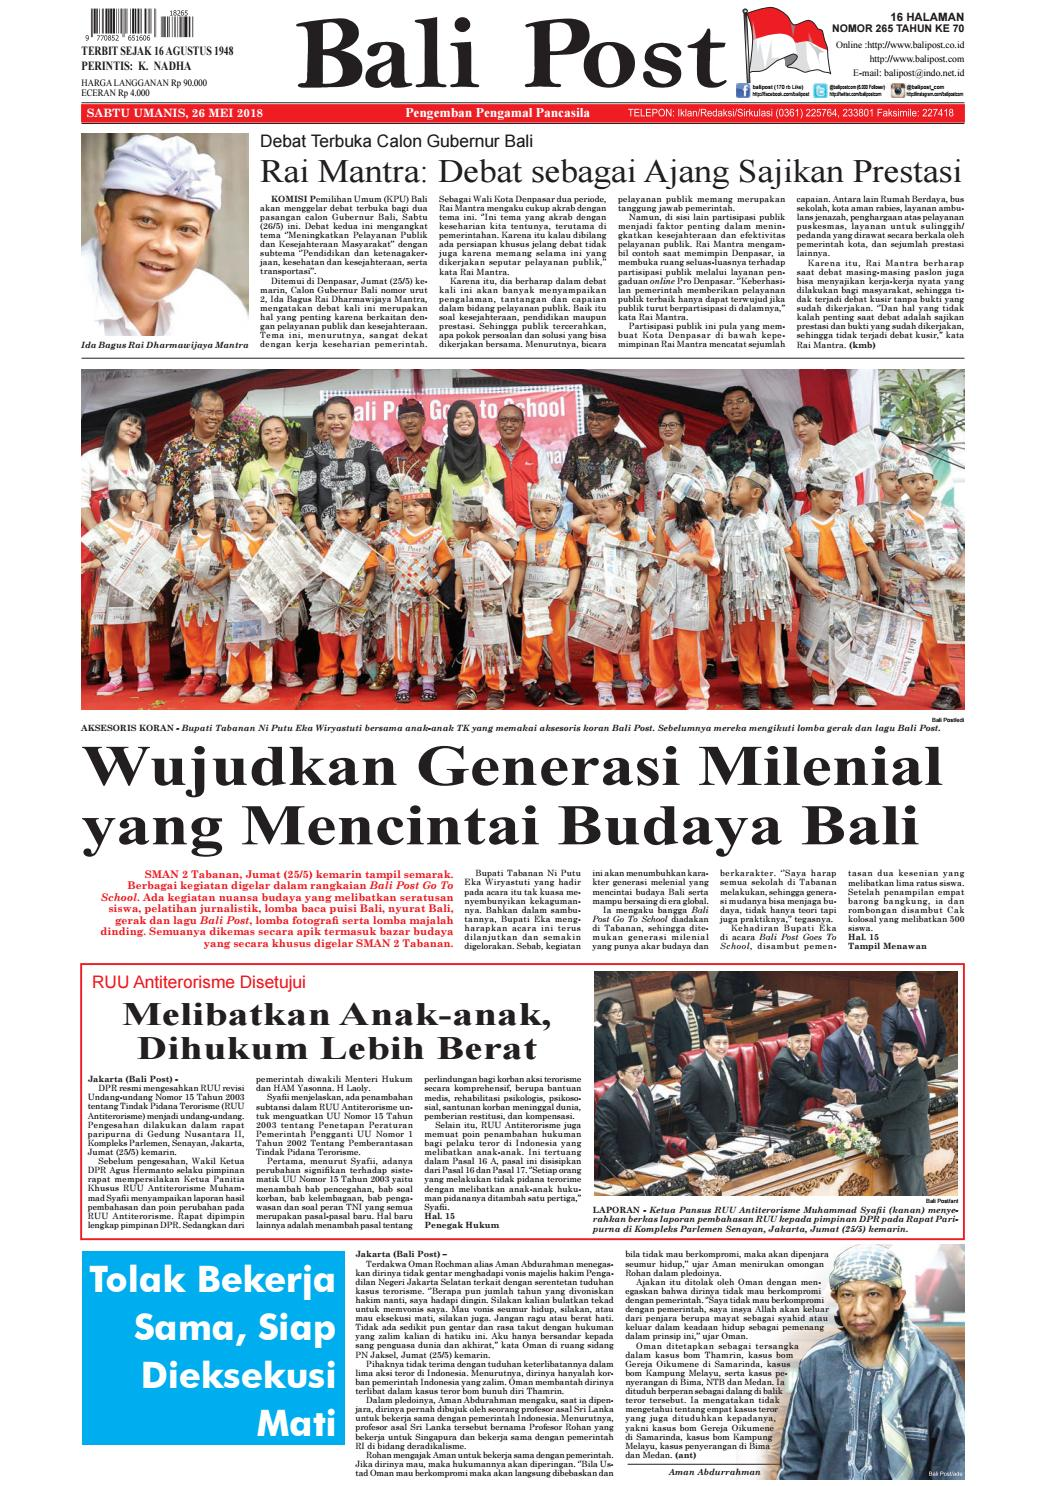 Edisi 26 Mei 2018 Balipostcom By E Paper Kmb Issuu Produk Ukm Bumn Philips Essential 18w